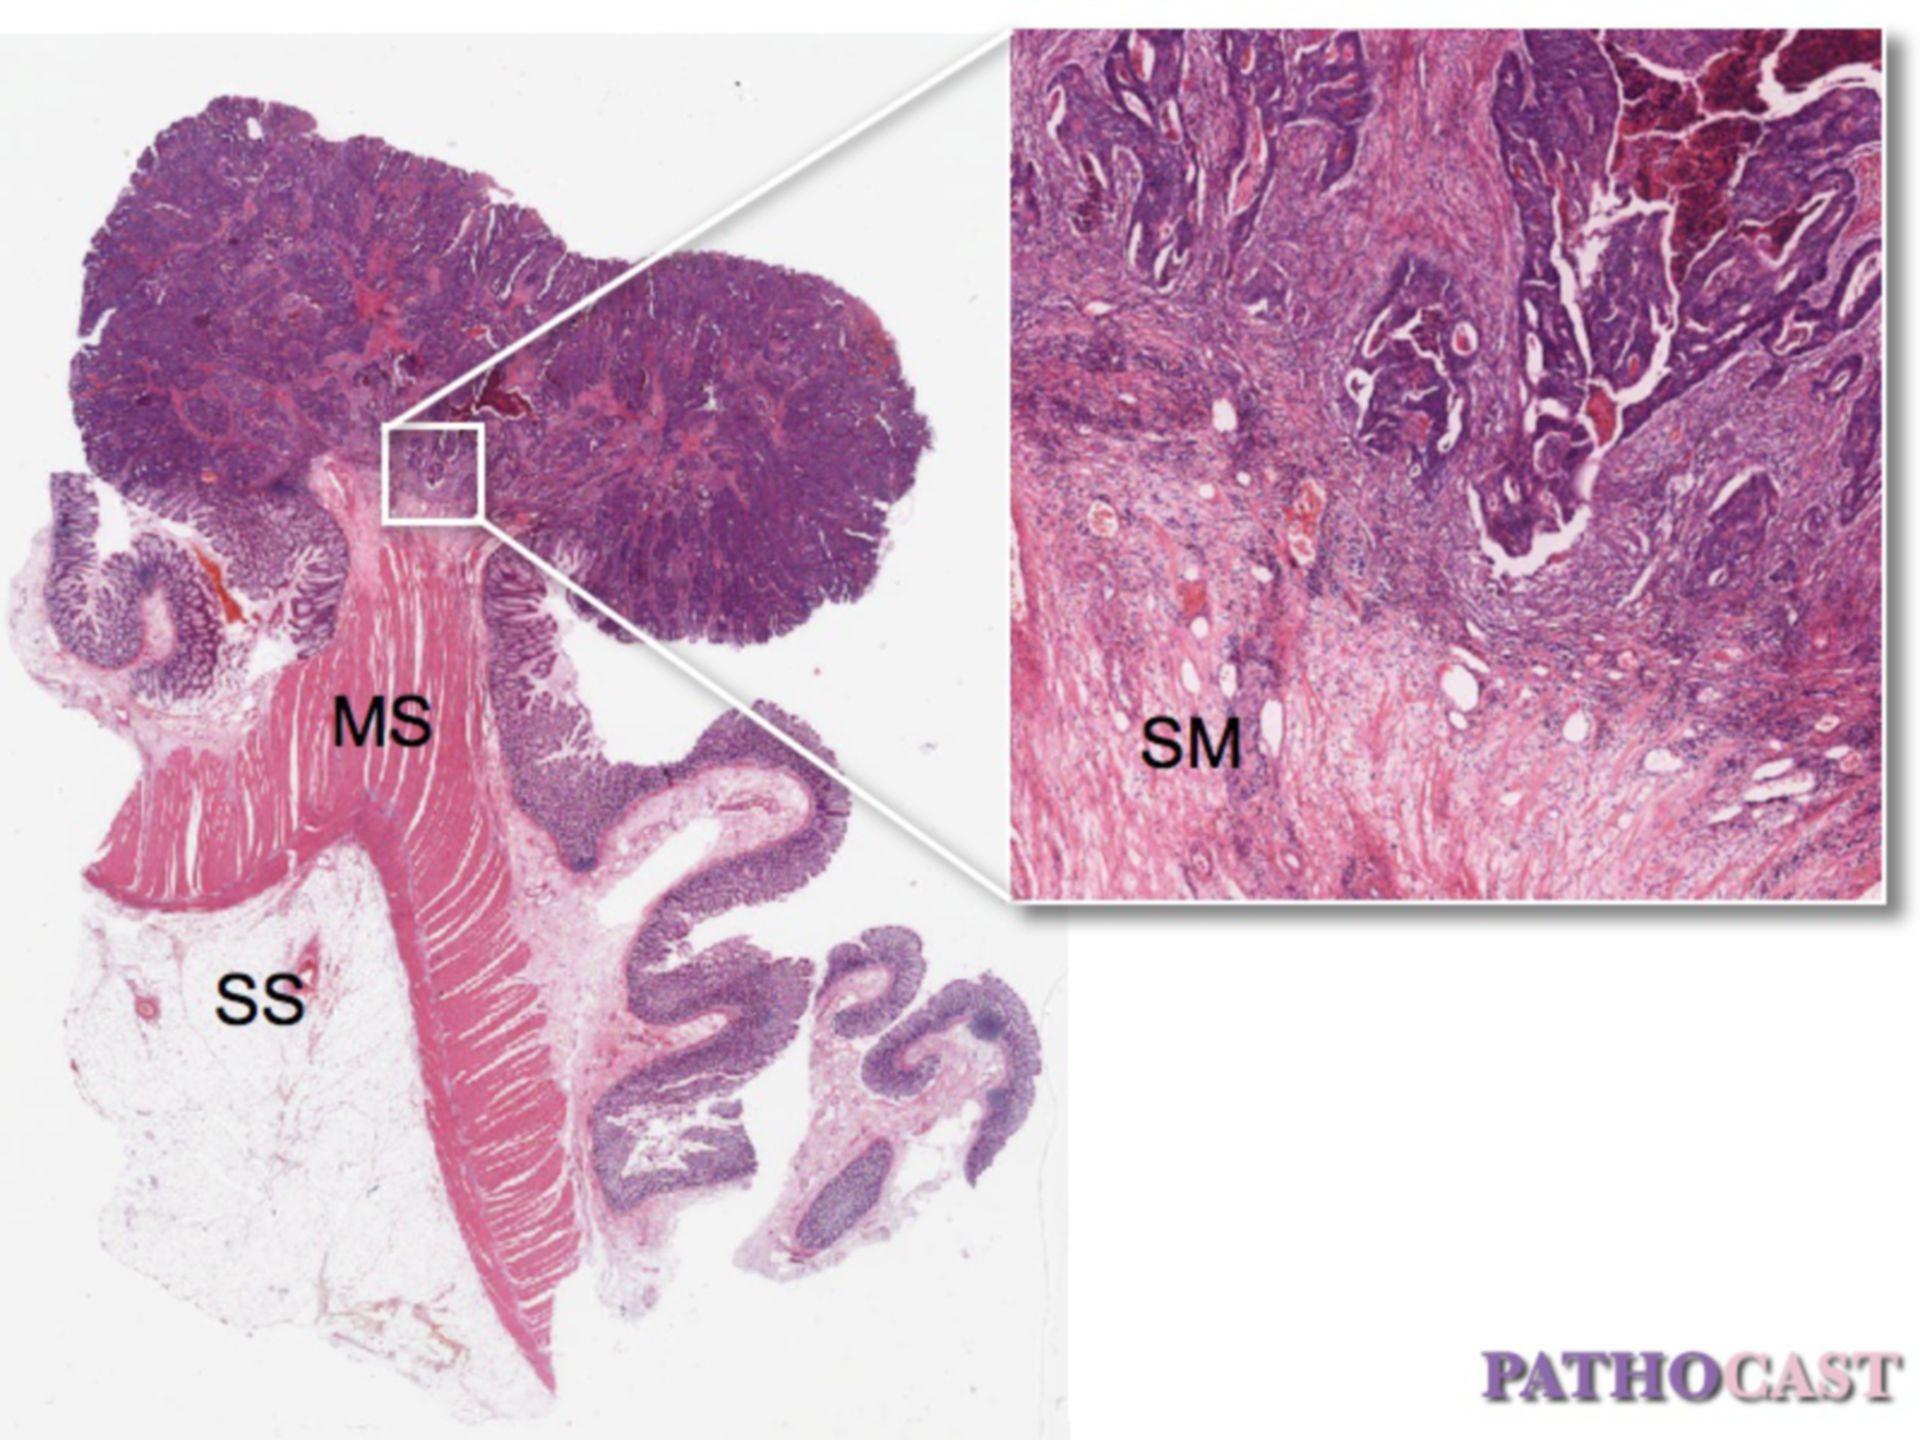 Pedunculated colon cancer